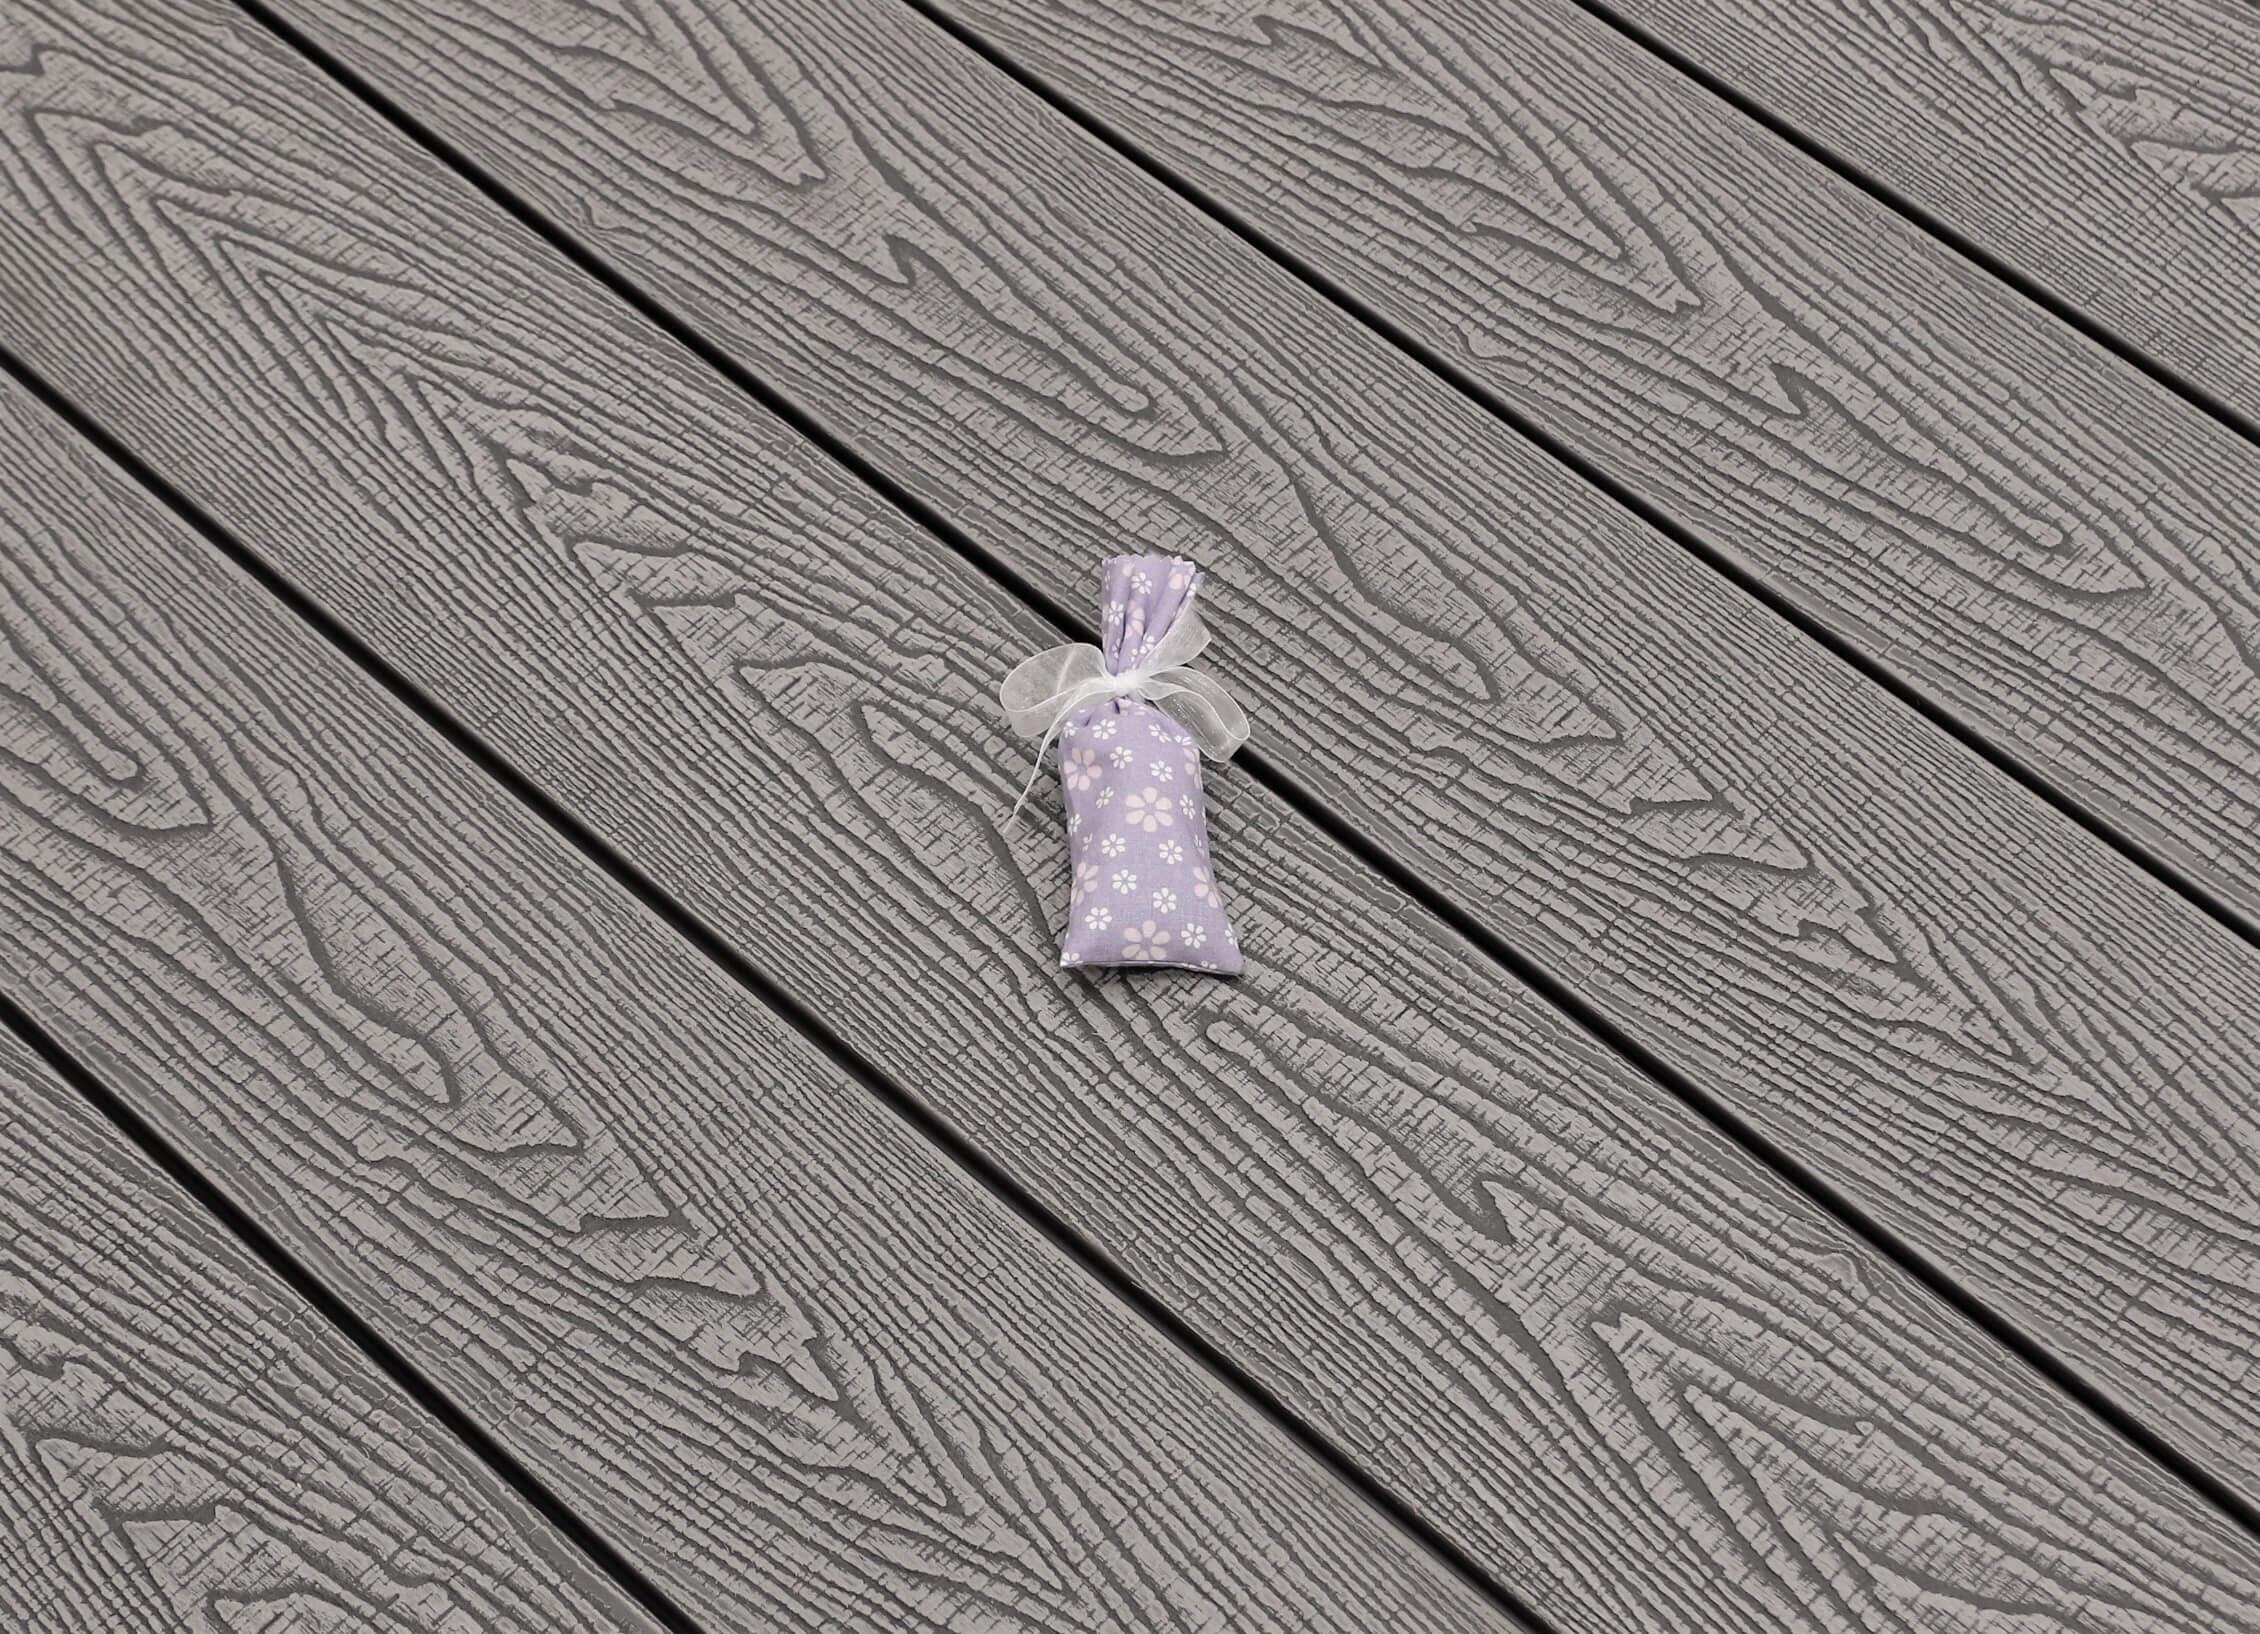 WPC Terrasse massiv, hellgrau, Oberfläche mit Struktur in Holzoptik sägerau, 22 x 143 bis 4800 mm, Vollprofil, 7,95 €/lfm